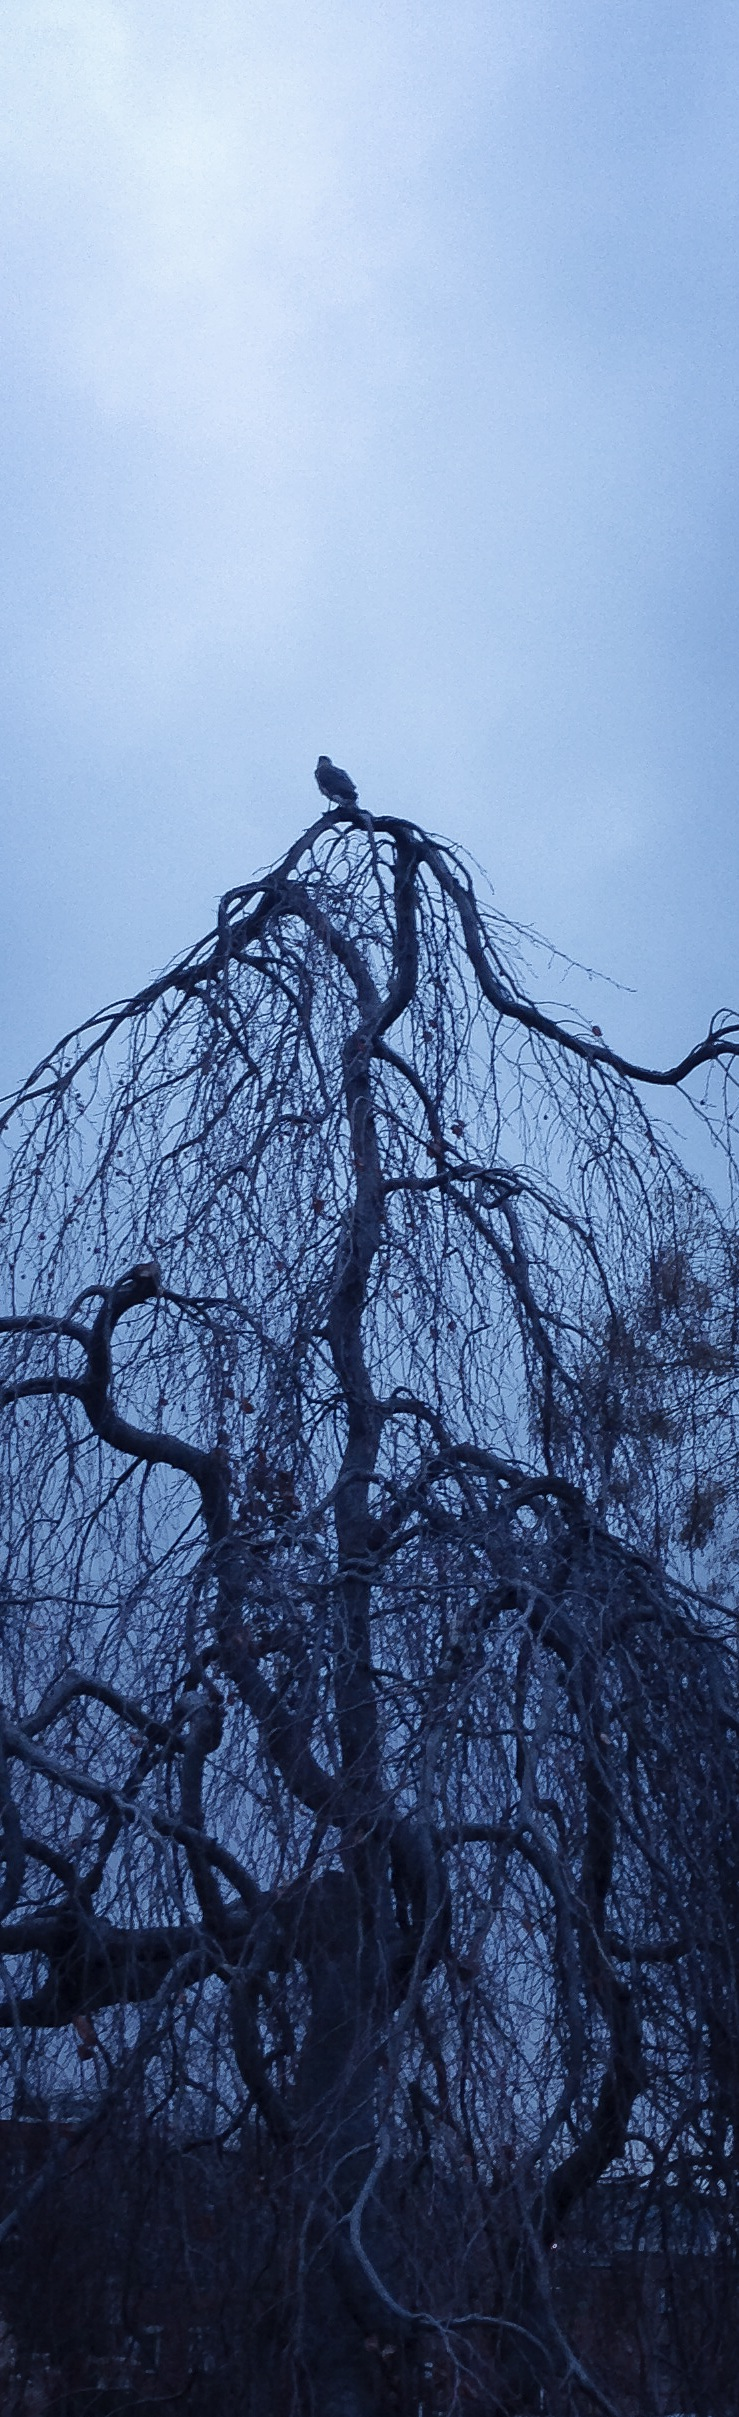 Topiary Park, January 11, 2014